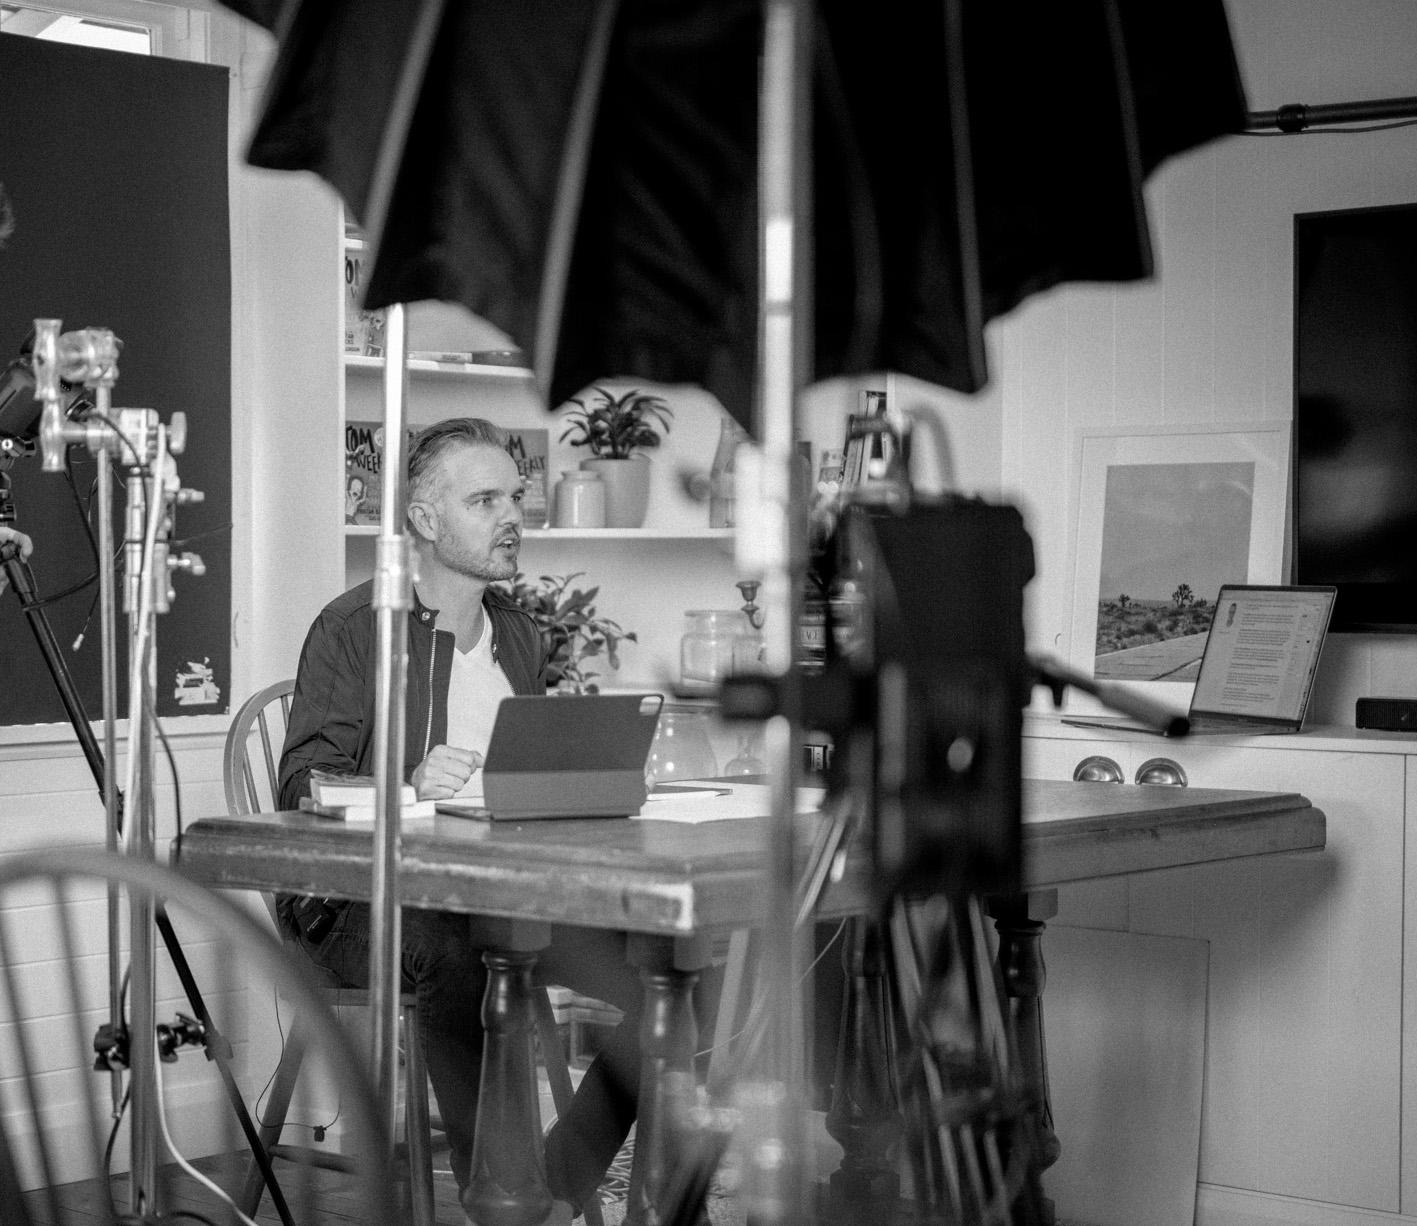 Tristan Bancks APPLE BTS Amber Melody Portrait Studio_1492 copy